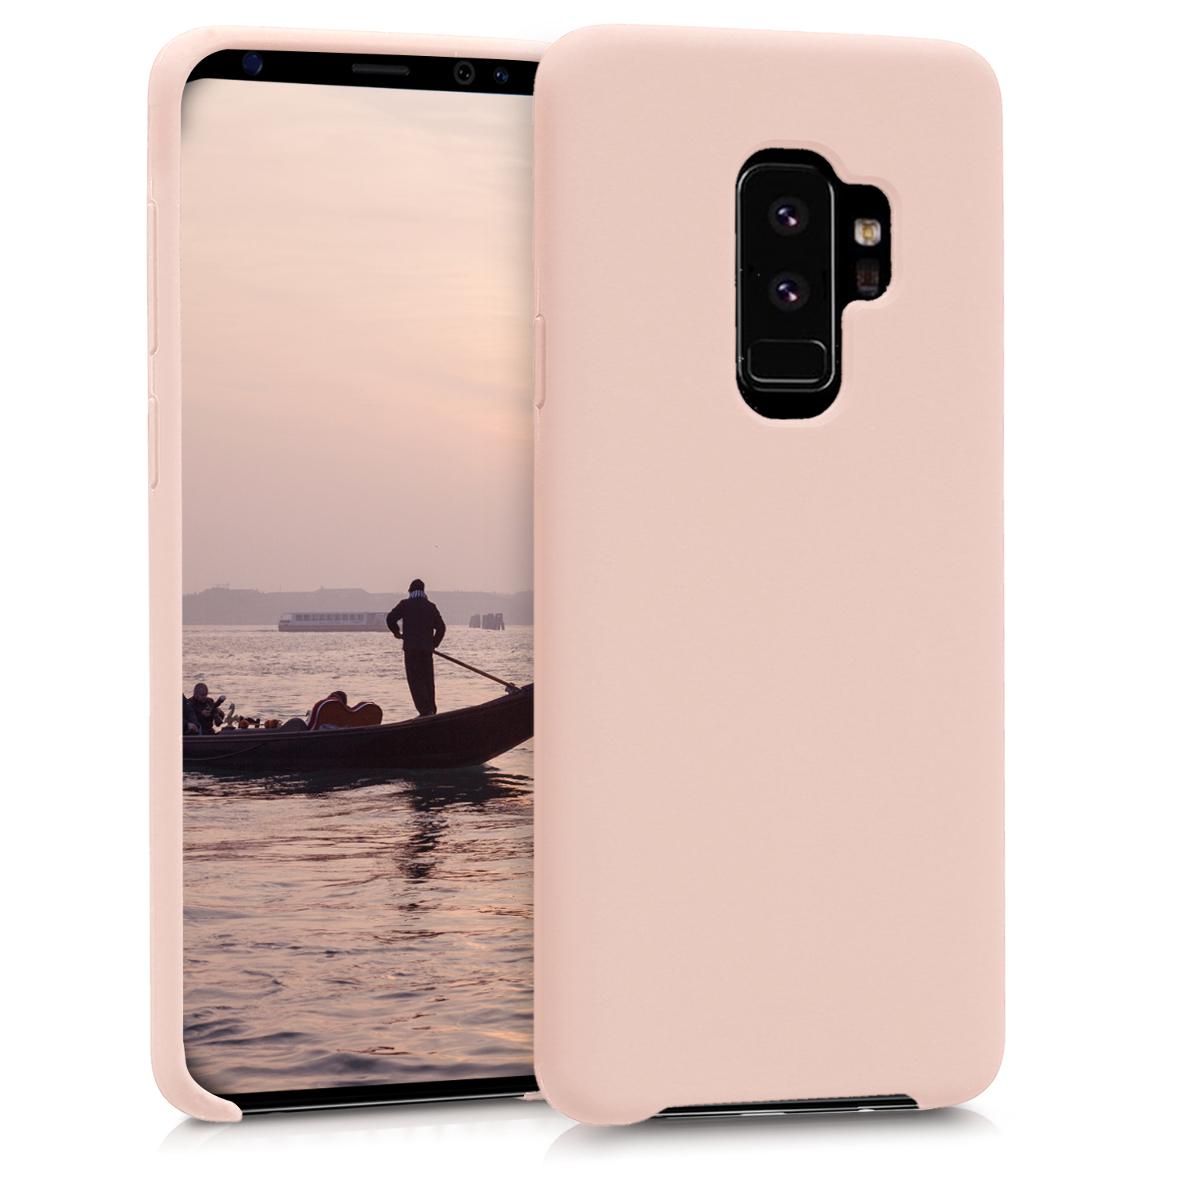 KW TPU Θήκη σιλικόνης Samsung Galaxy S9 Plus - Light Pink Matte (44183.52)